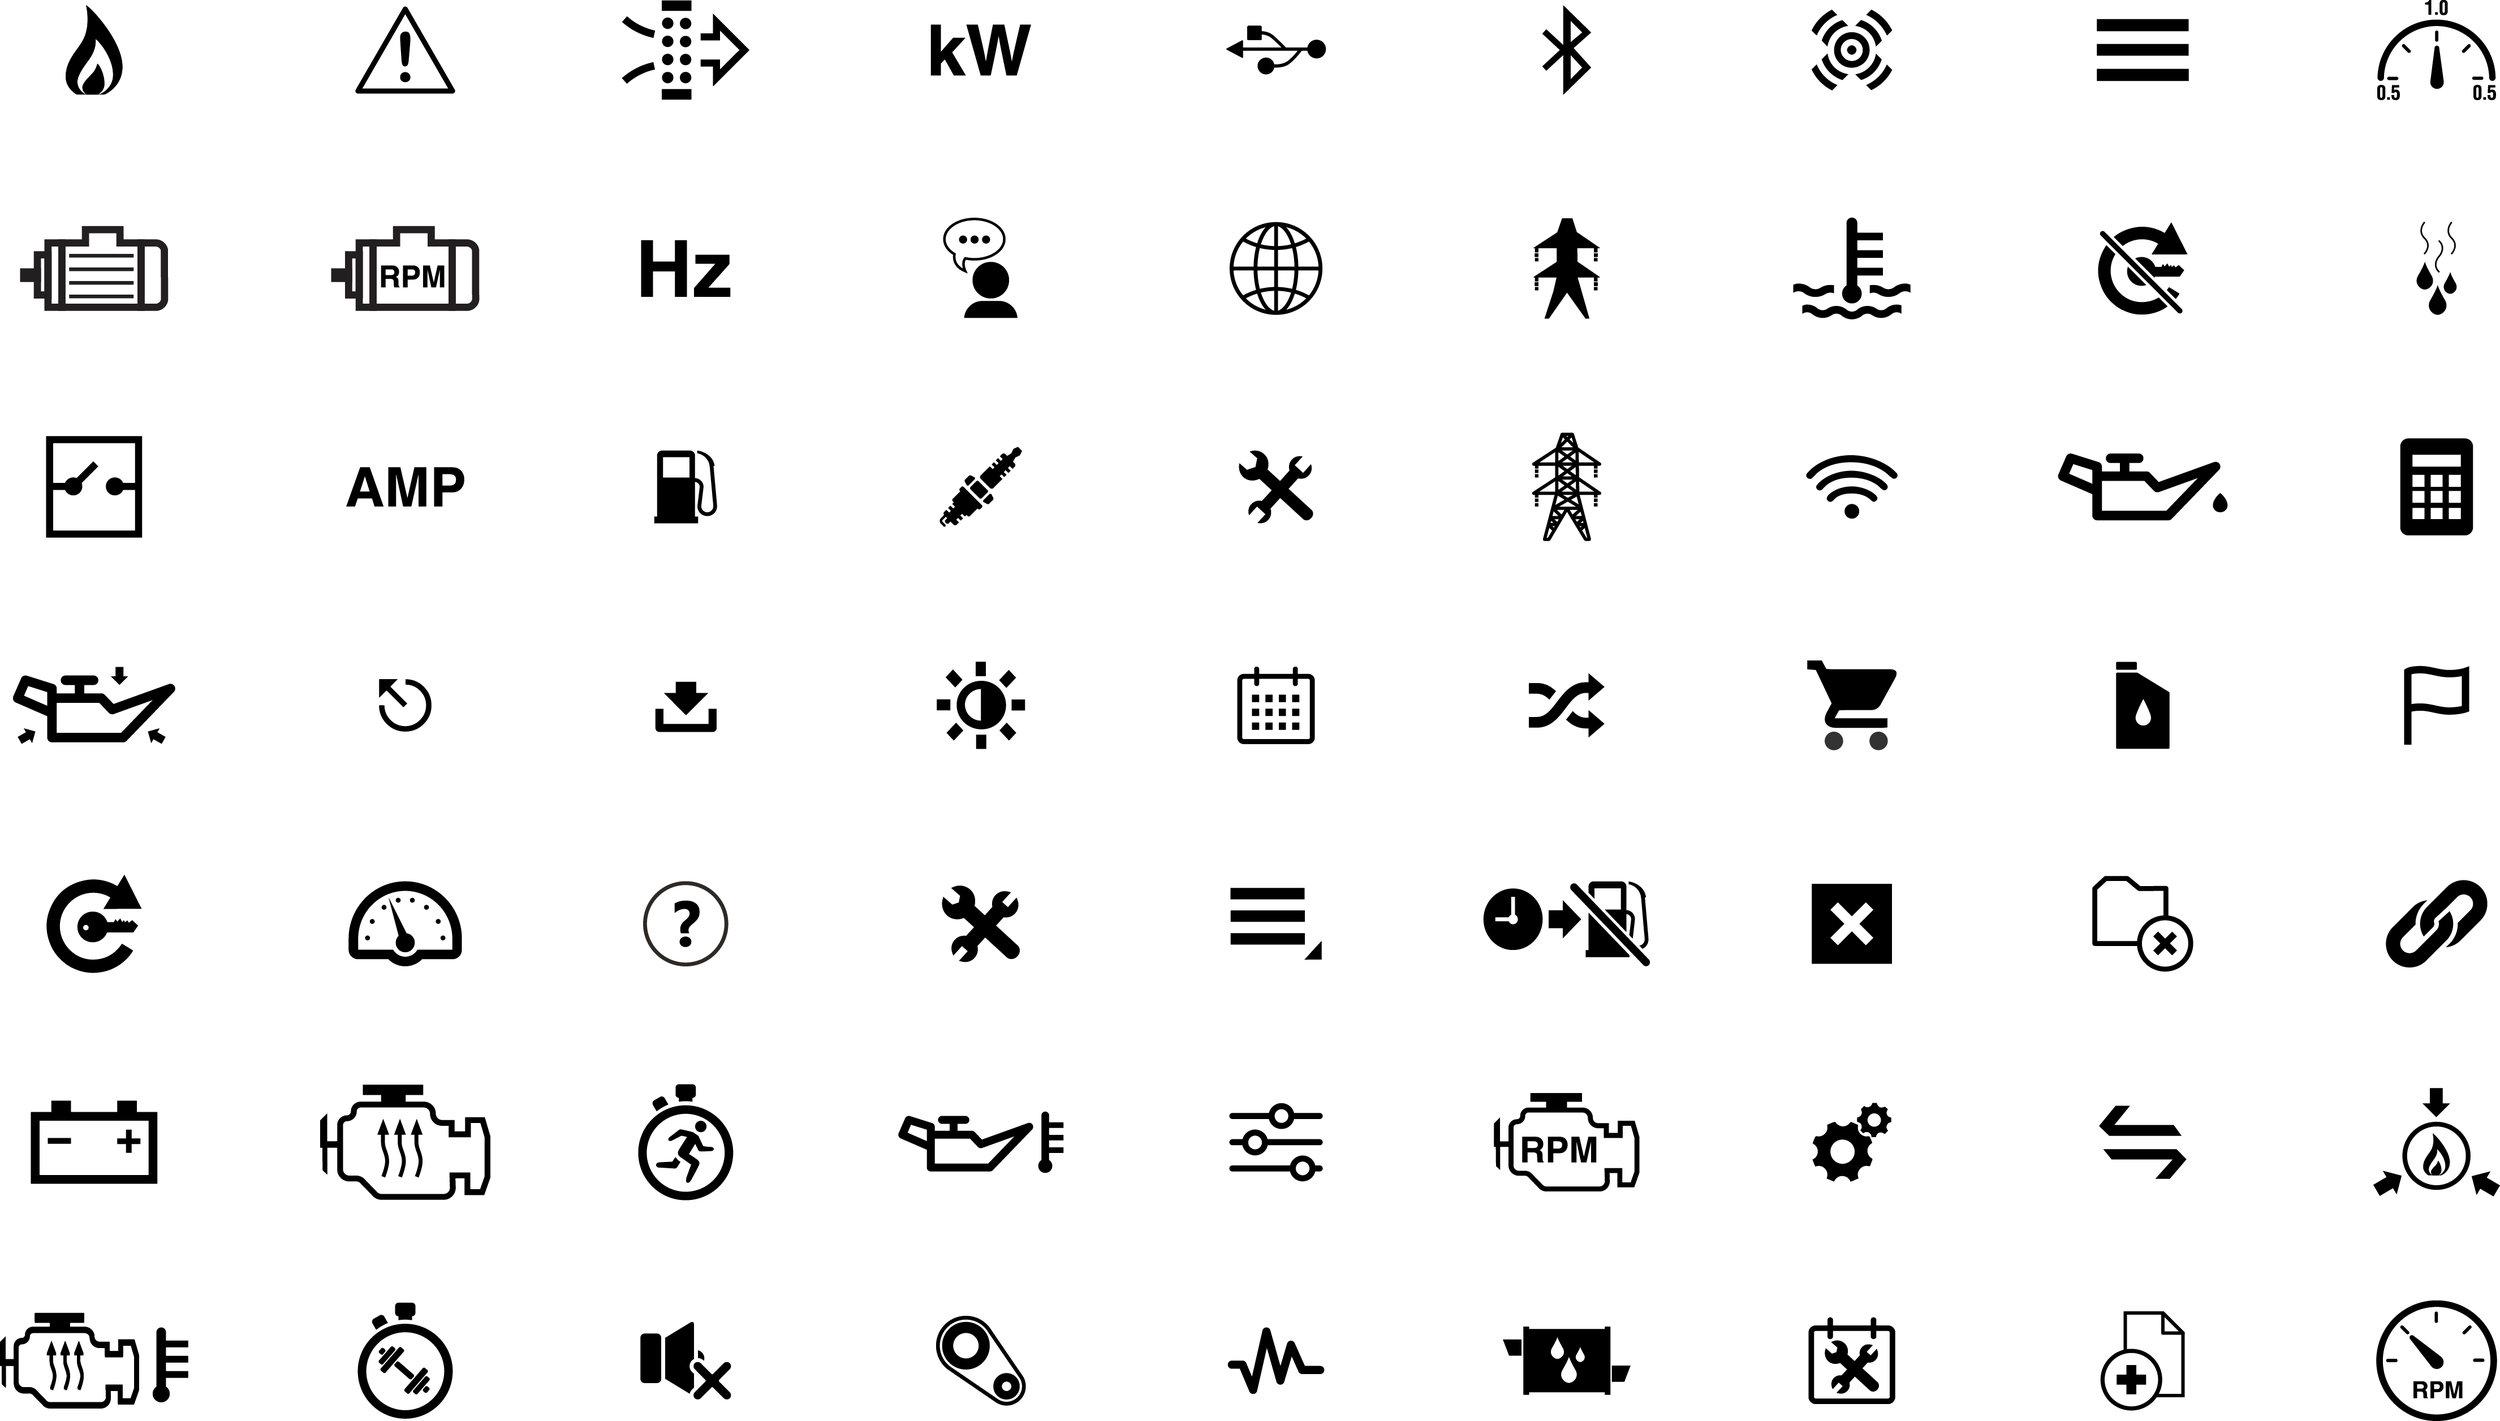 Icons_001.jpg